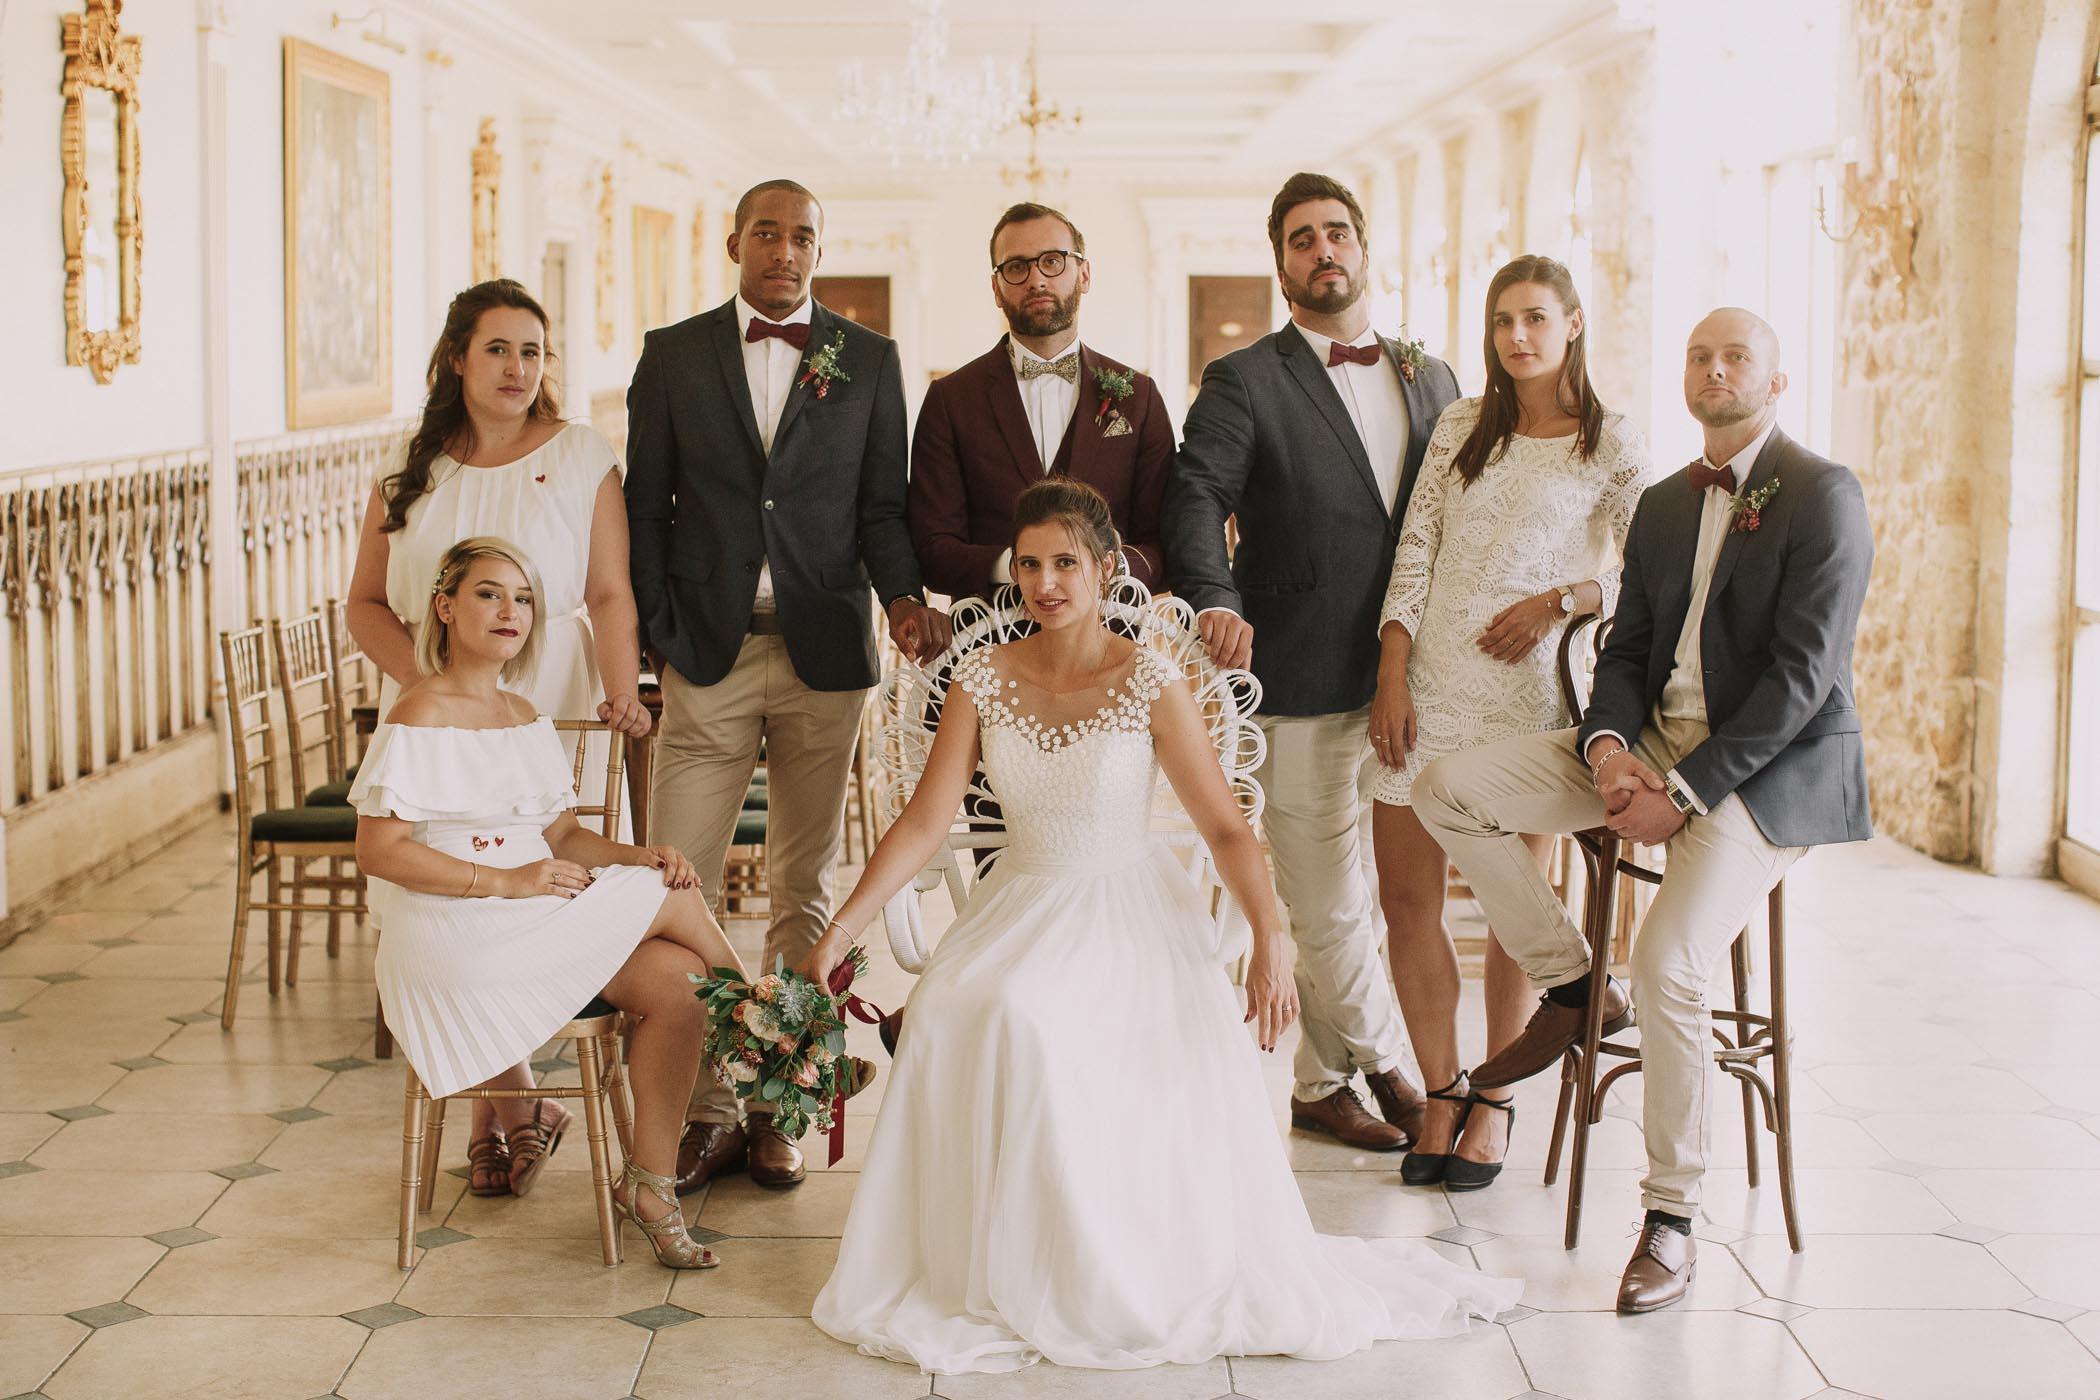 Photographe-mariage-bordeaux-jeremy-boyer-14.jpg